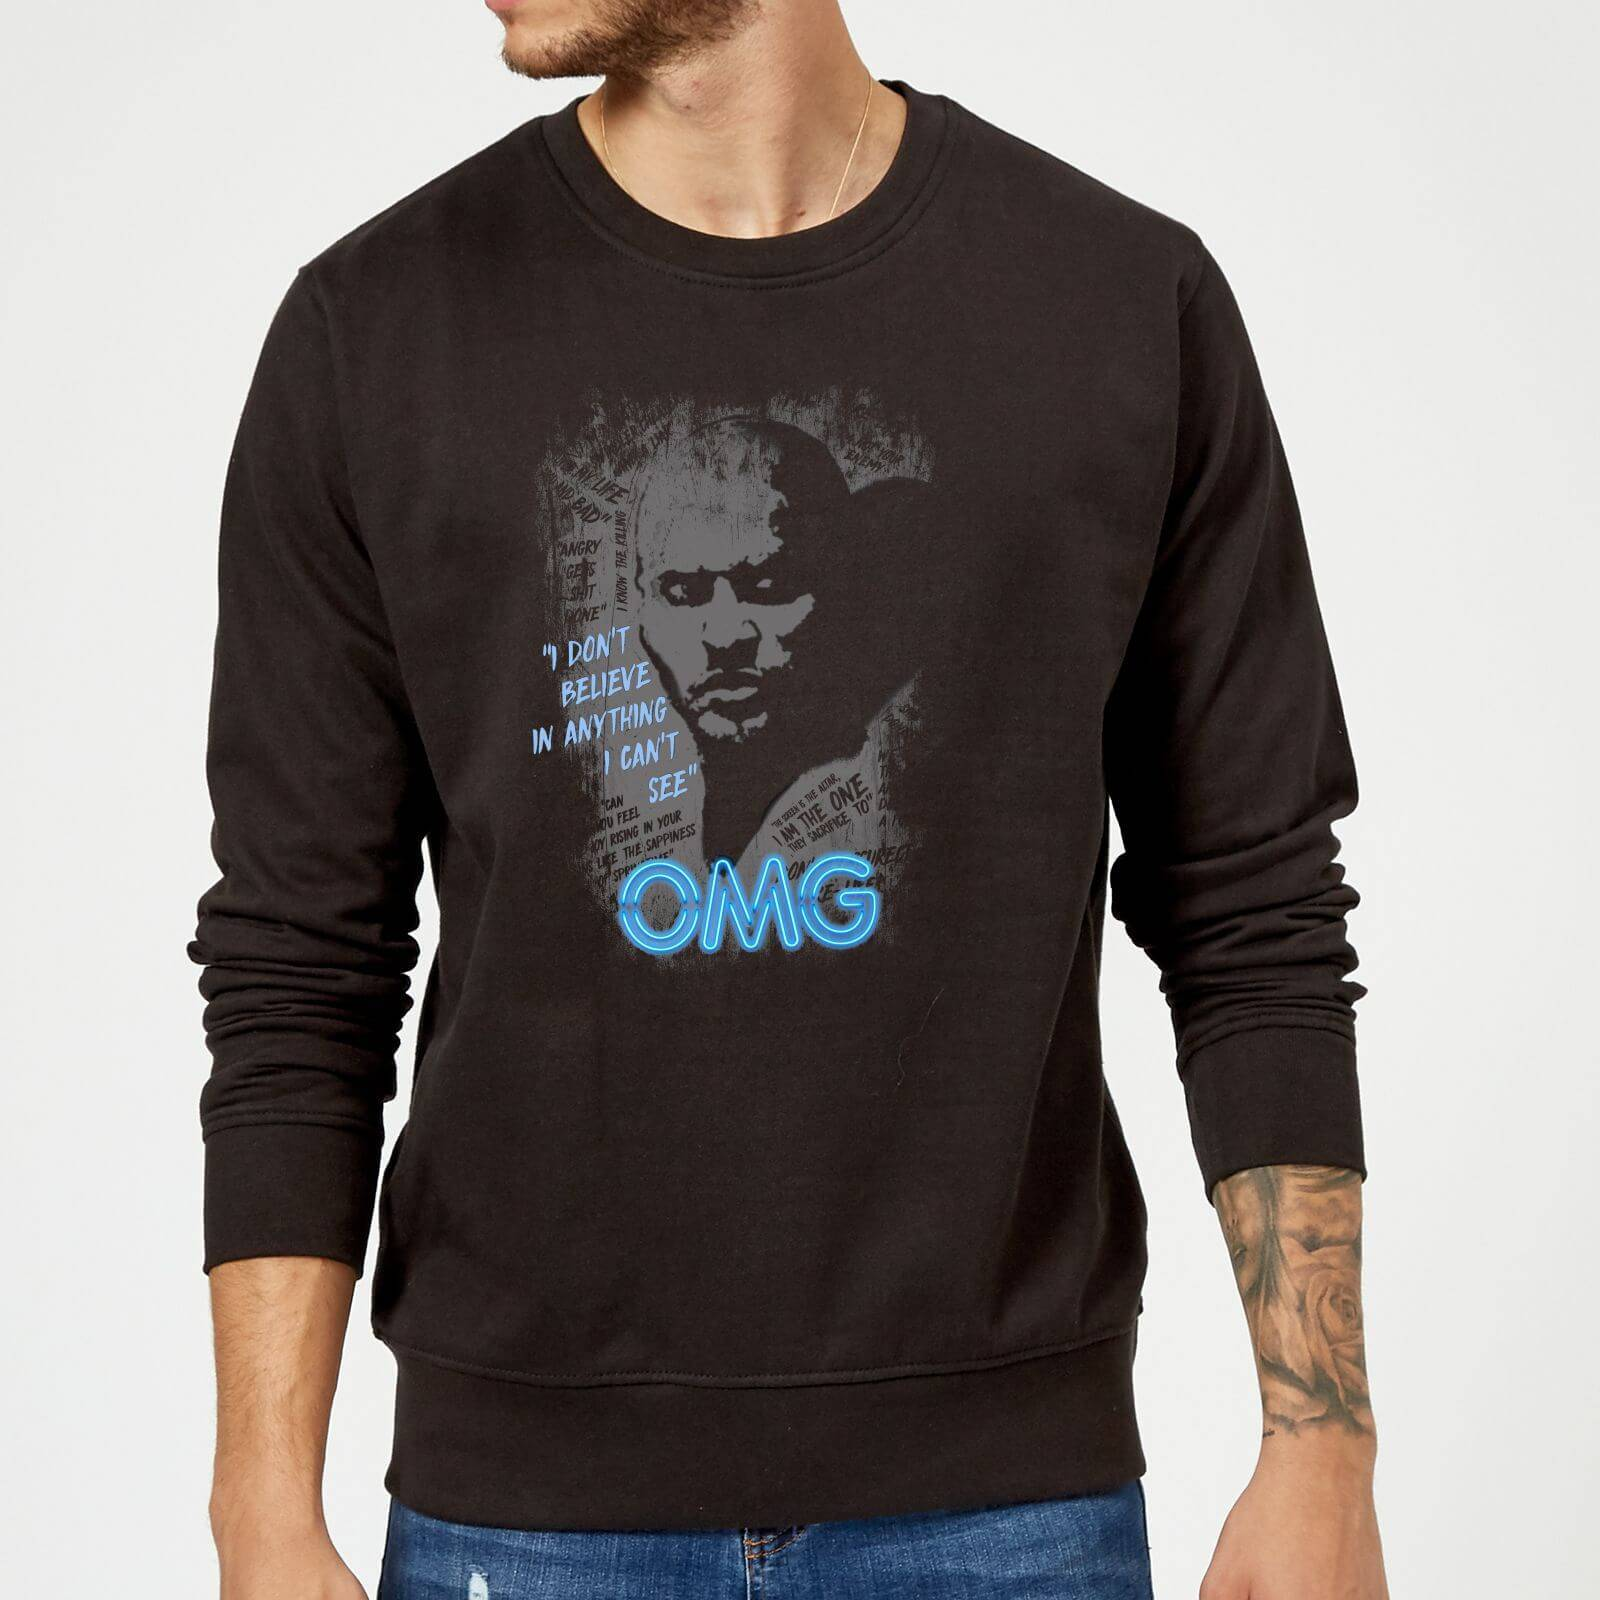 American Gods Shadow OMG Sweatshirt - Black - L - Black